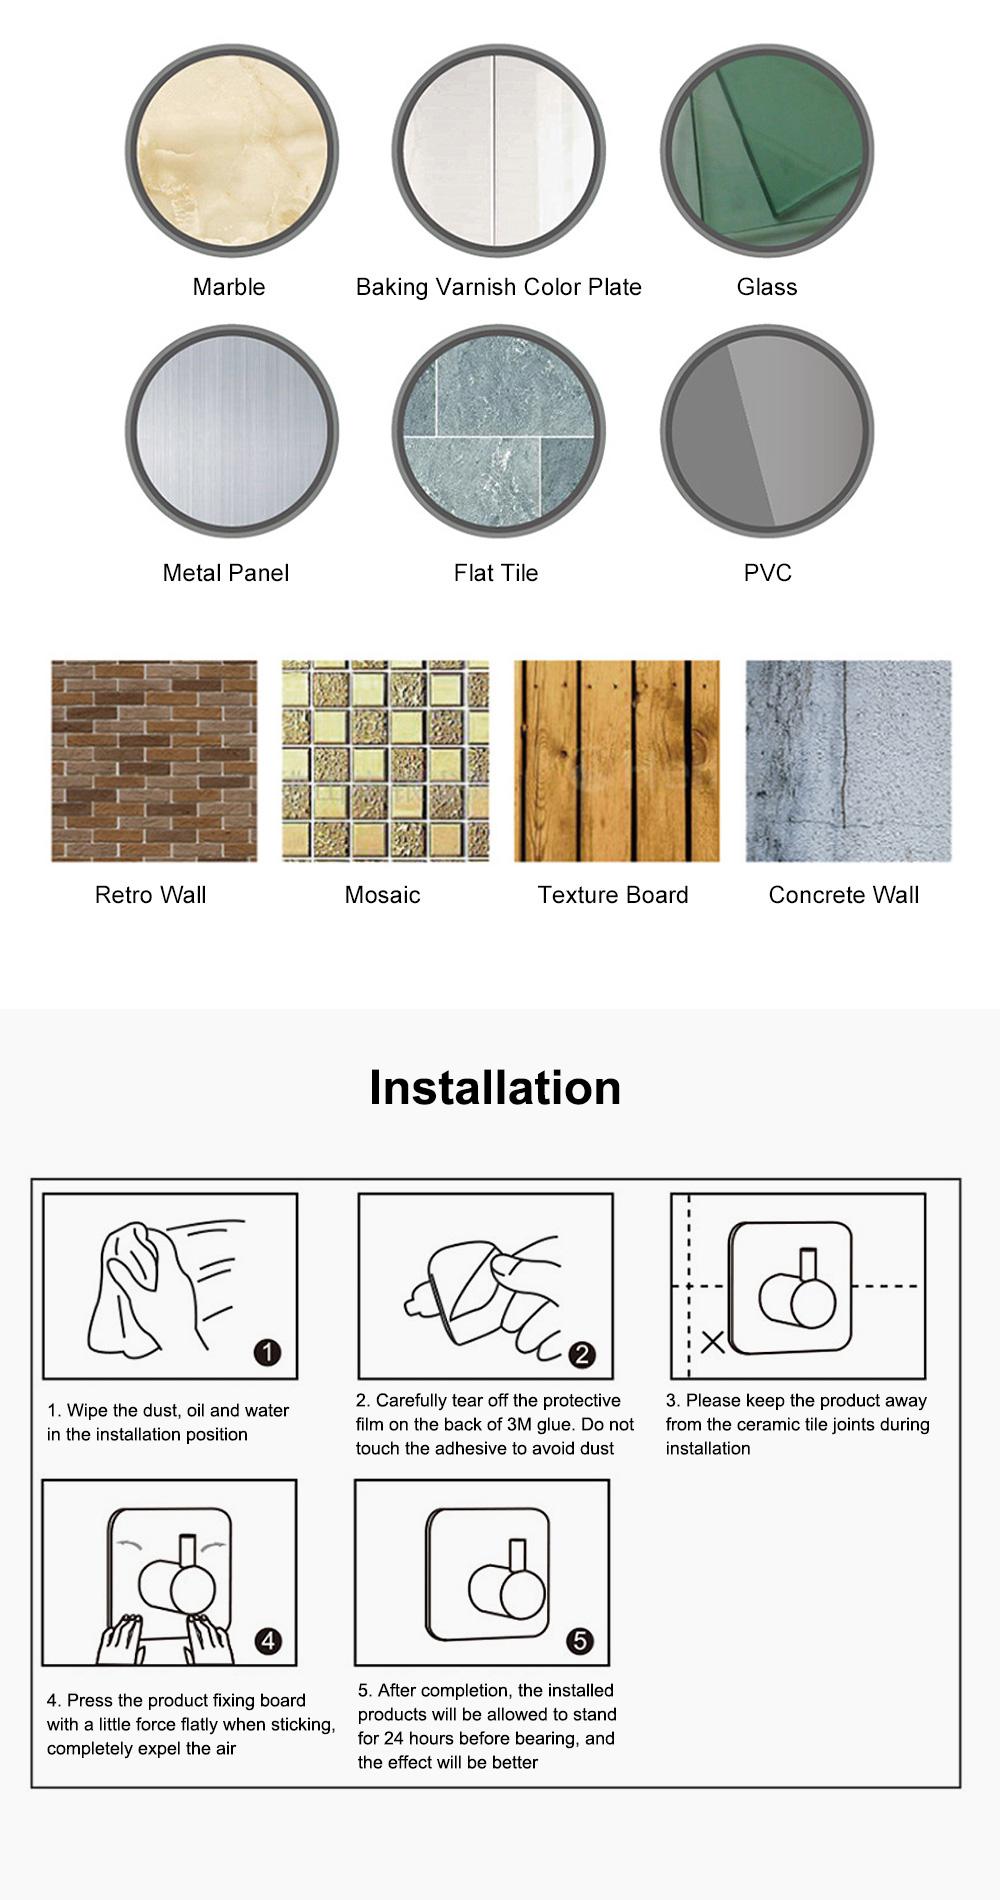 3M Glue Long Tail Hooks for Kitchen Bathroom Bedroom Hanging Waterproof 304 Stainless Steel Wall Hooks 8